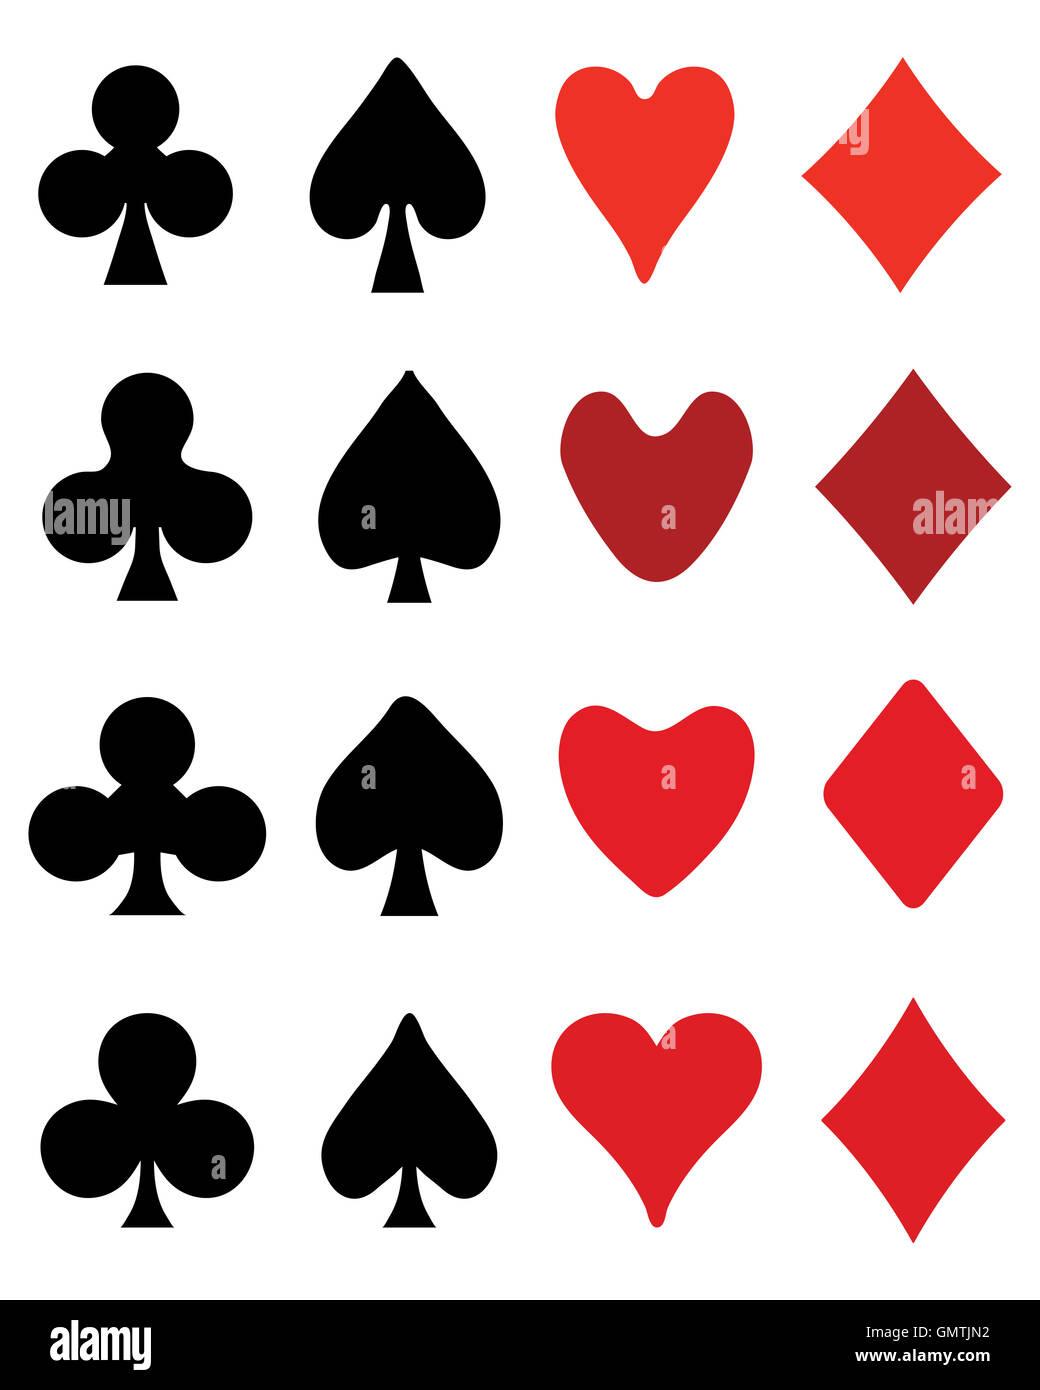 Set of playing card symbols stock photo royalty free image set of playing card symbols biocorpaavc